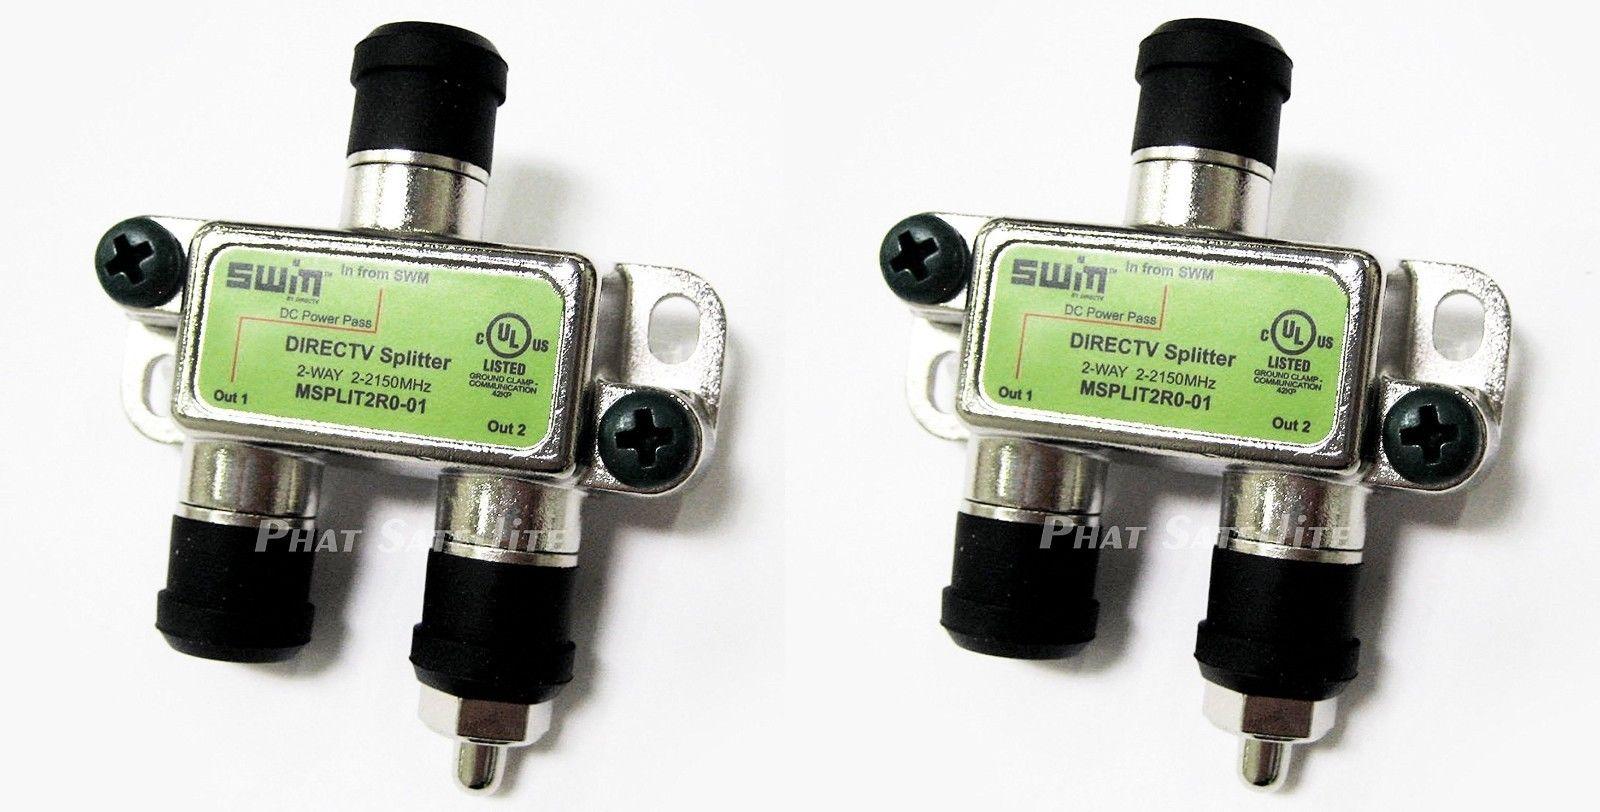 hight resolution of  9 95 2 qty directv 2 way swm splitter msplit2r0 01 swim multi switch